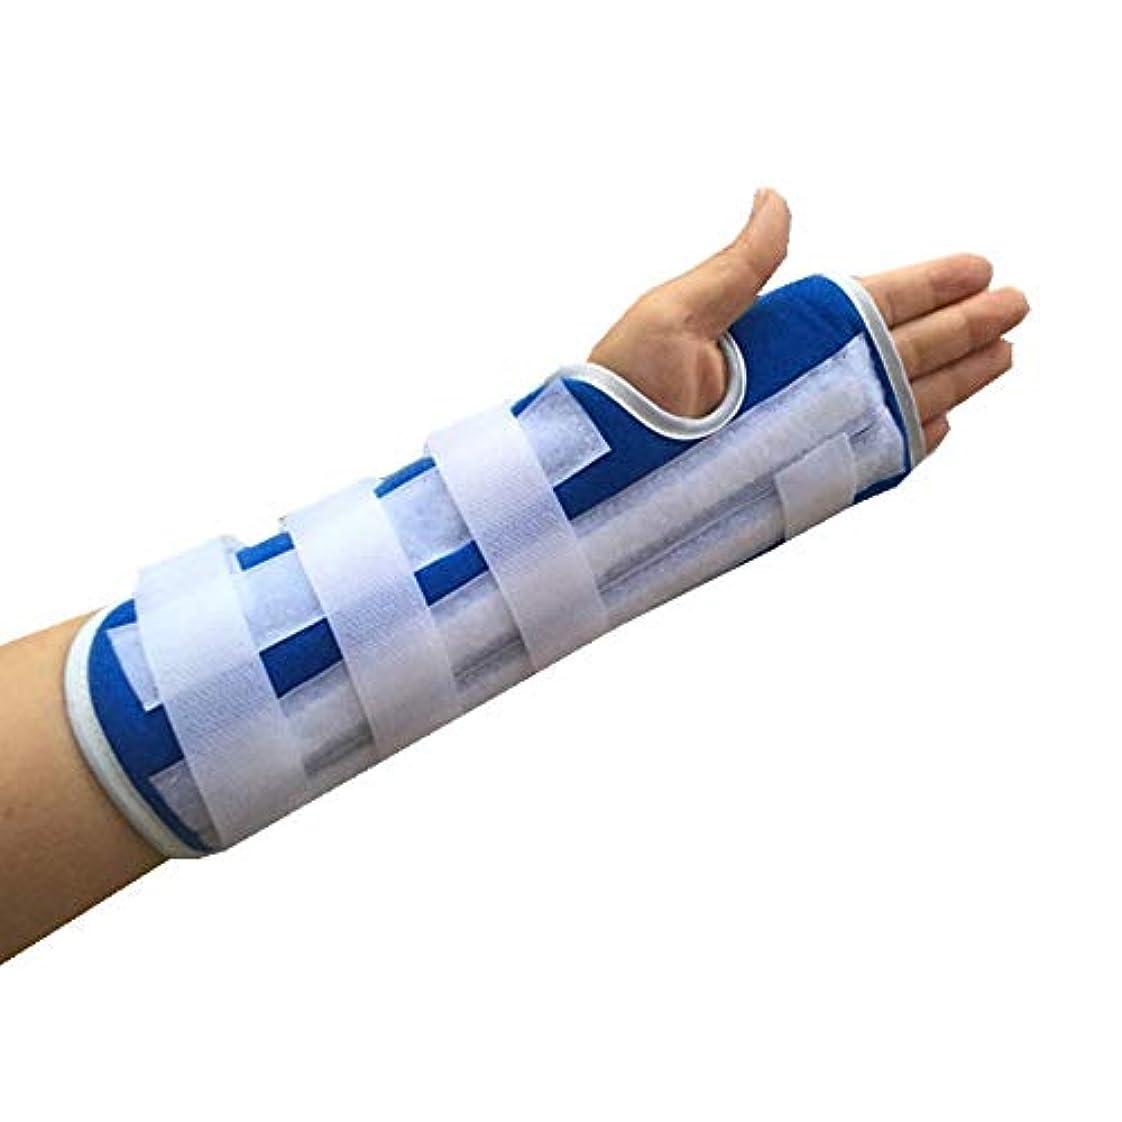 ZYL-YL プレート固定と前腕スーパー関節サポート手首プロテクター前腕脛骨スプリントサポート手首捻挫骨折 (Edition : Left)